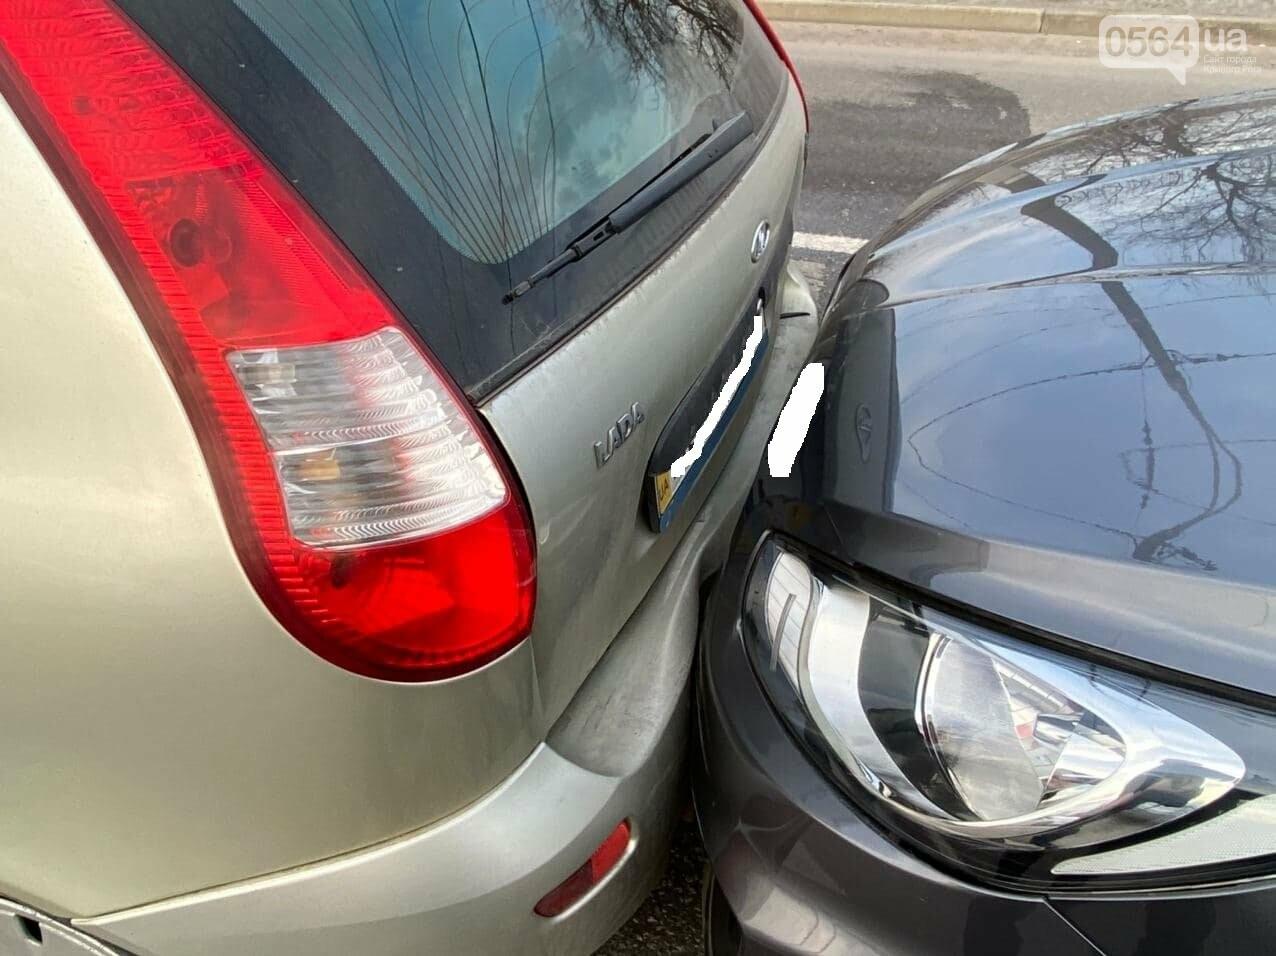 5 машин разбились в ДТП в Кривом Роге, - ФОТО, фото-5